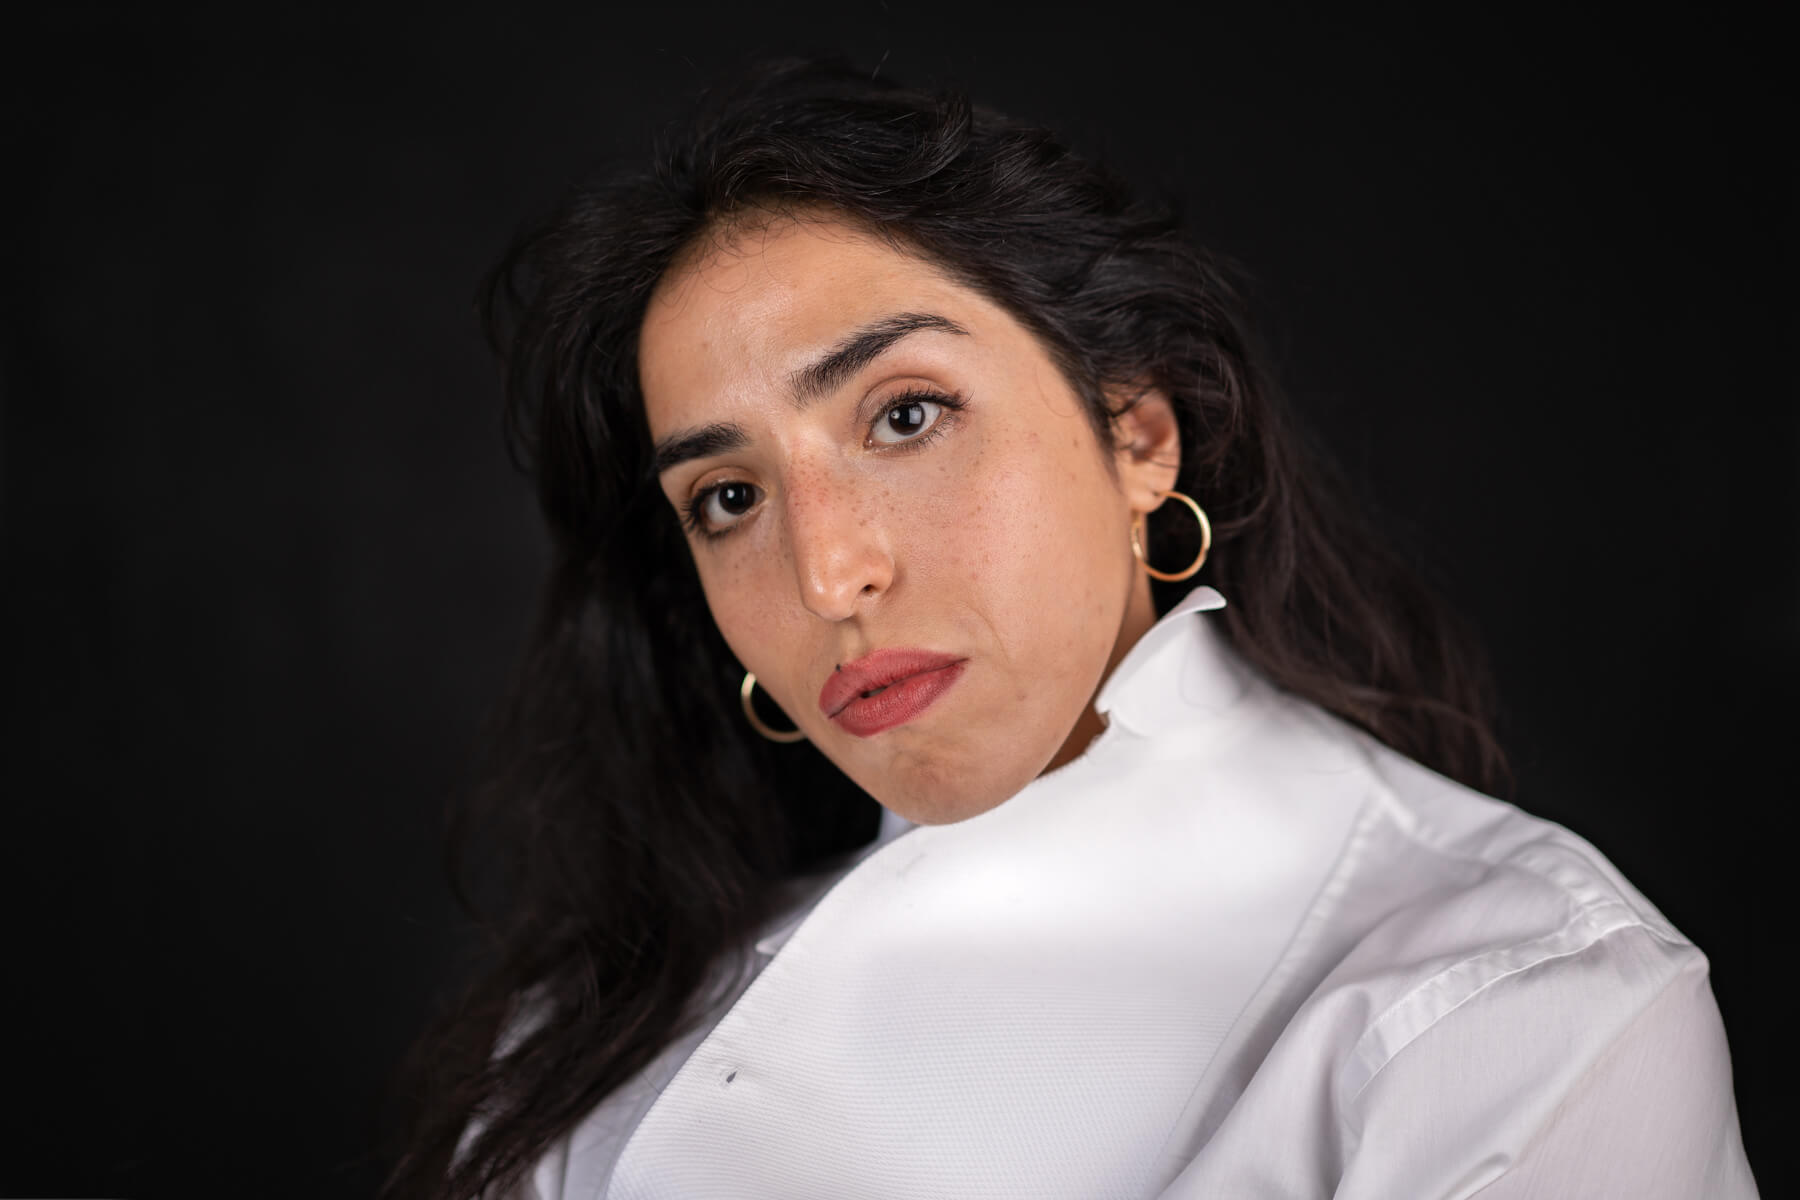 Robin Kirchner Susana Abdulmajid